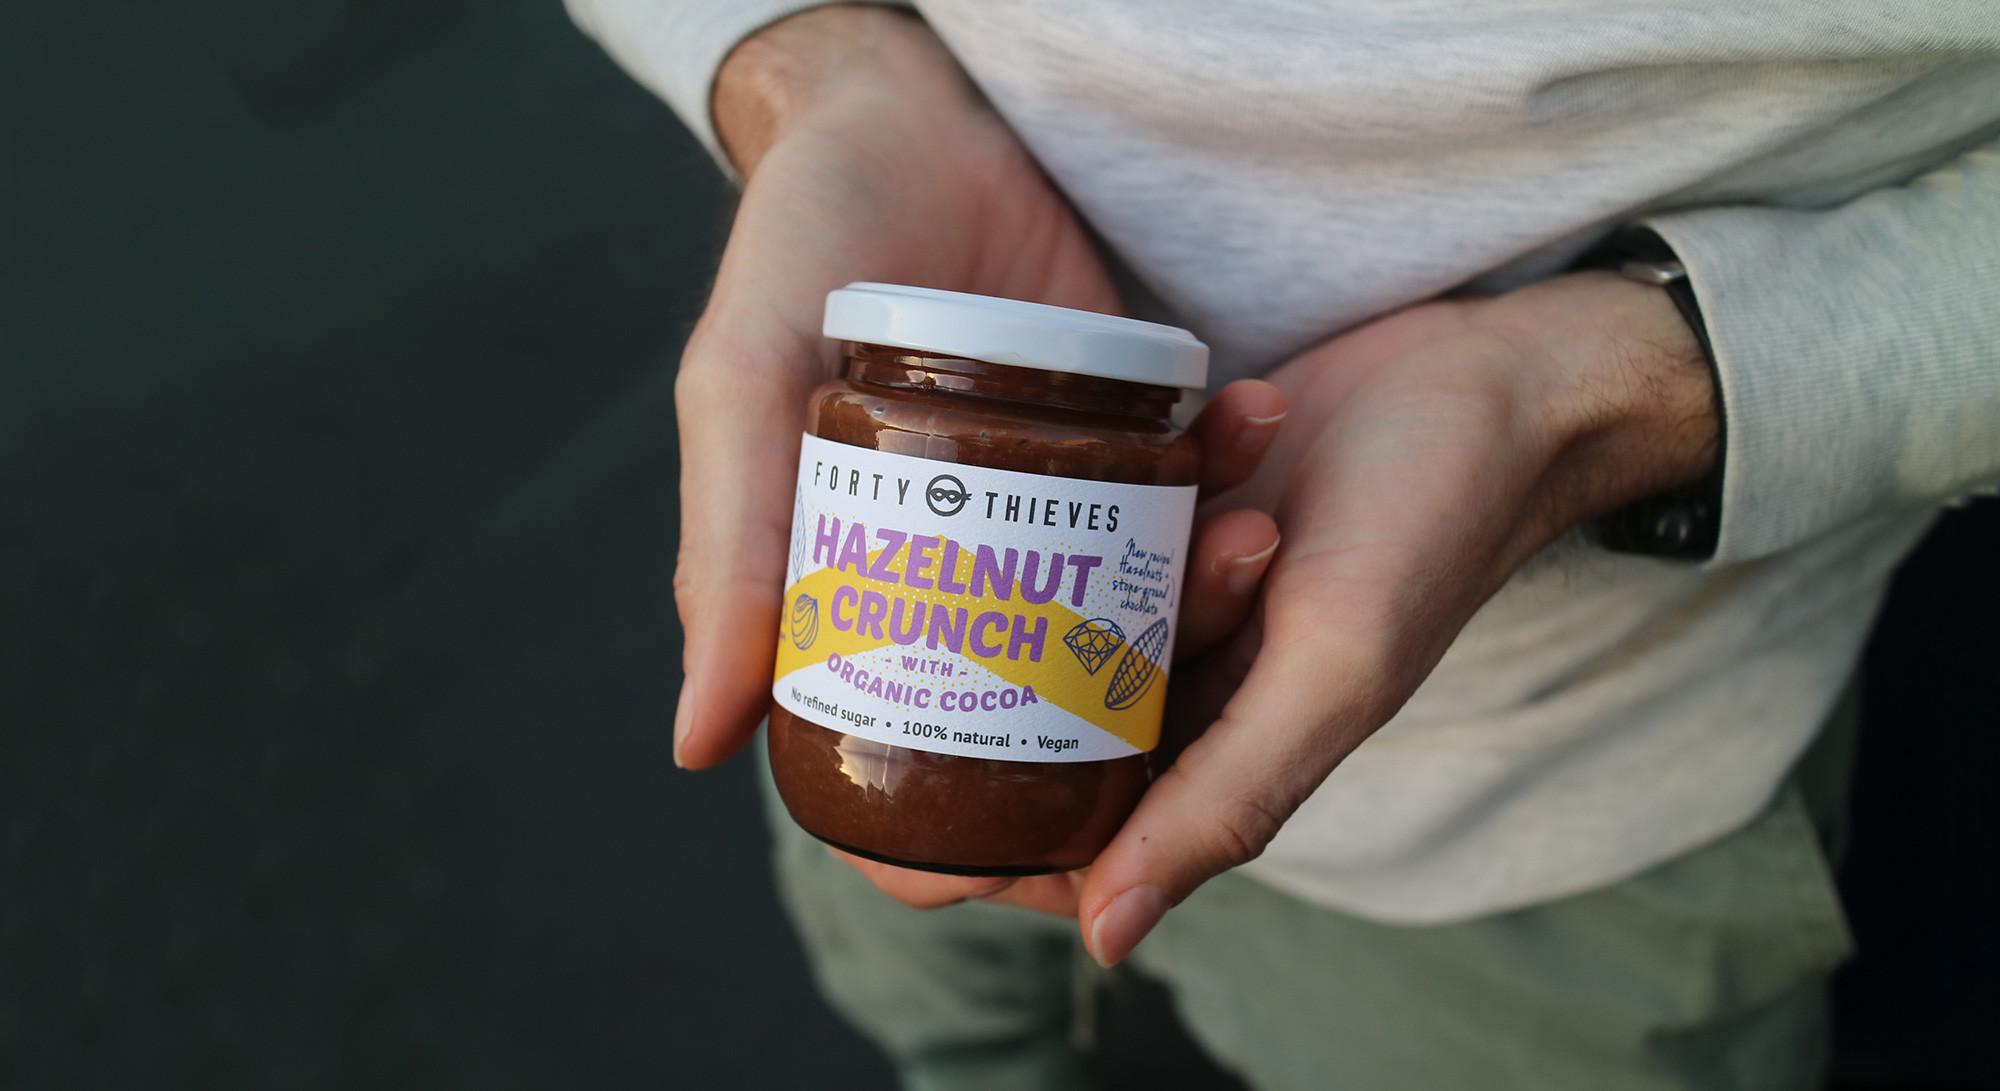 Hazelnuts + Organic Chocolate